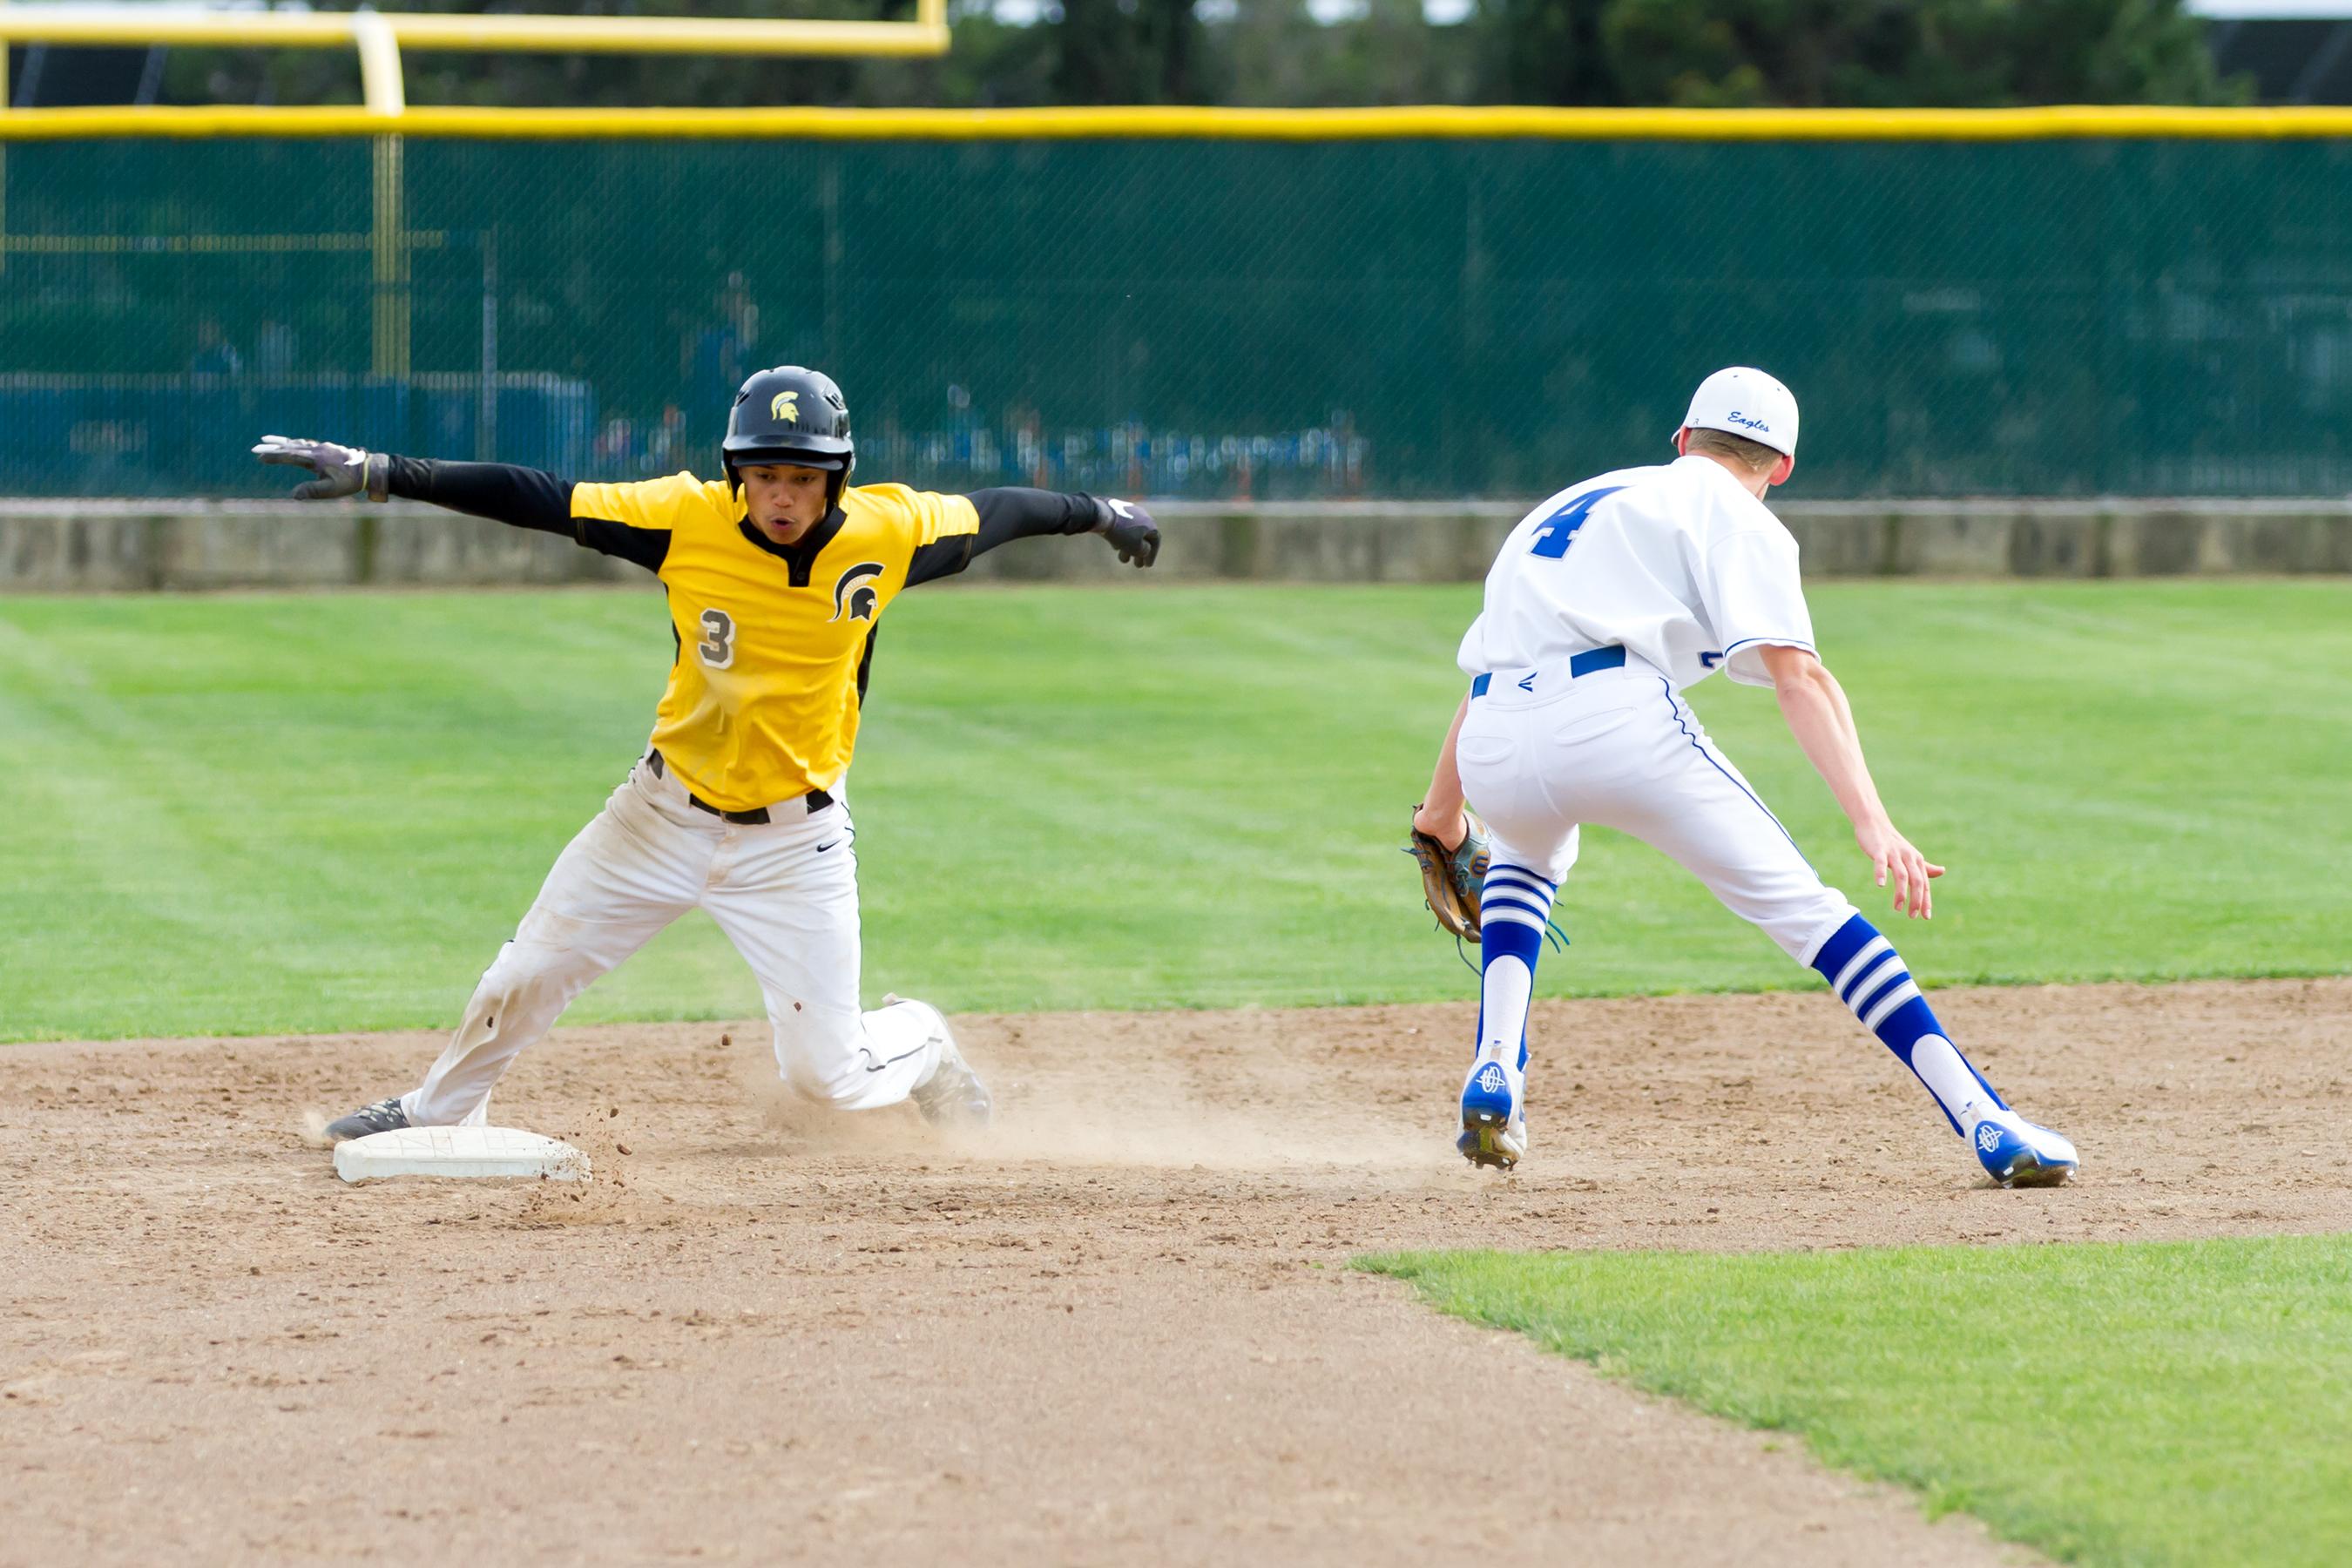 Mountain View baseball